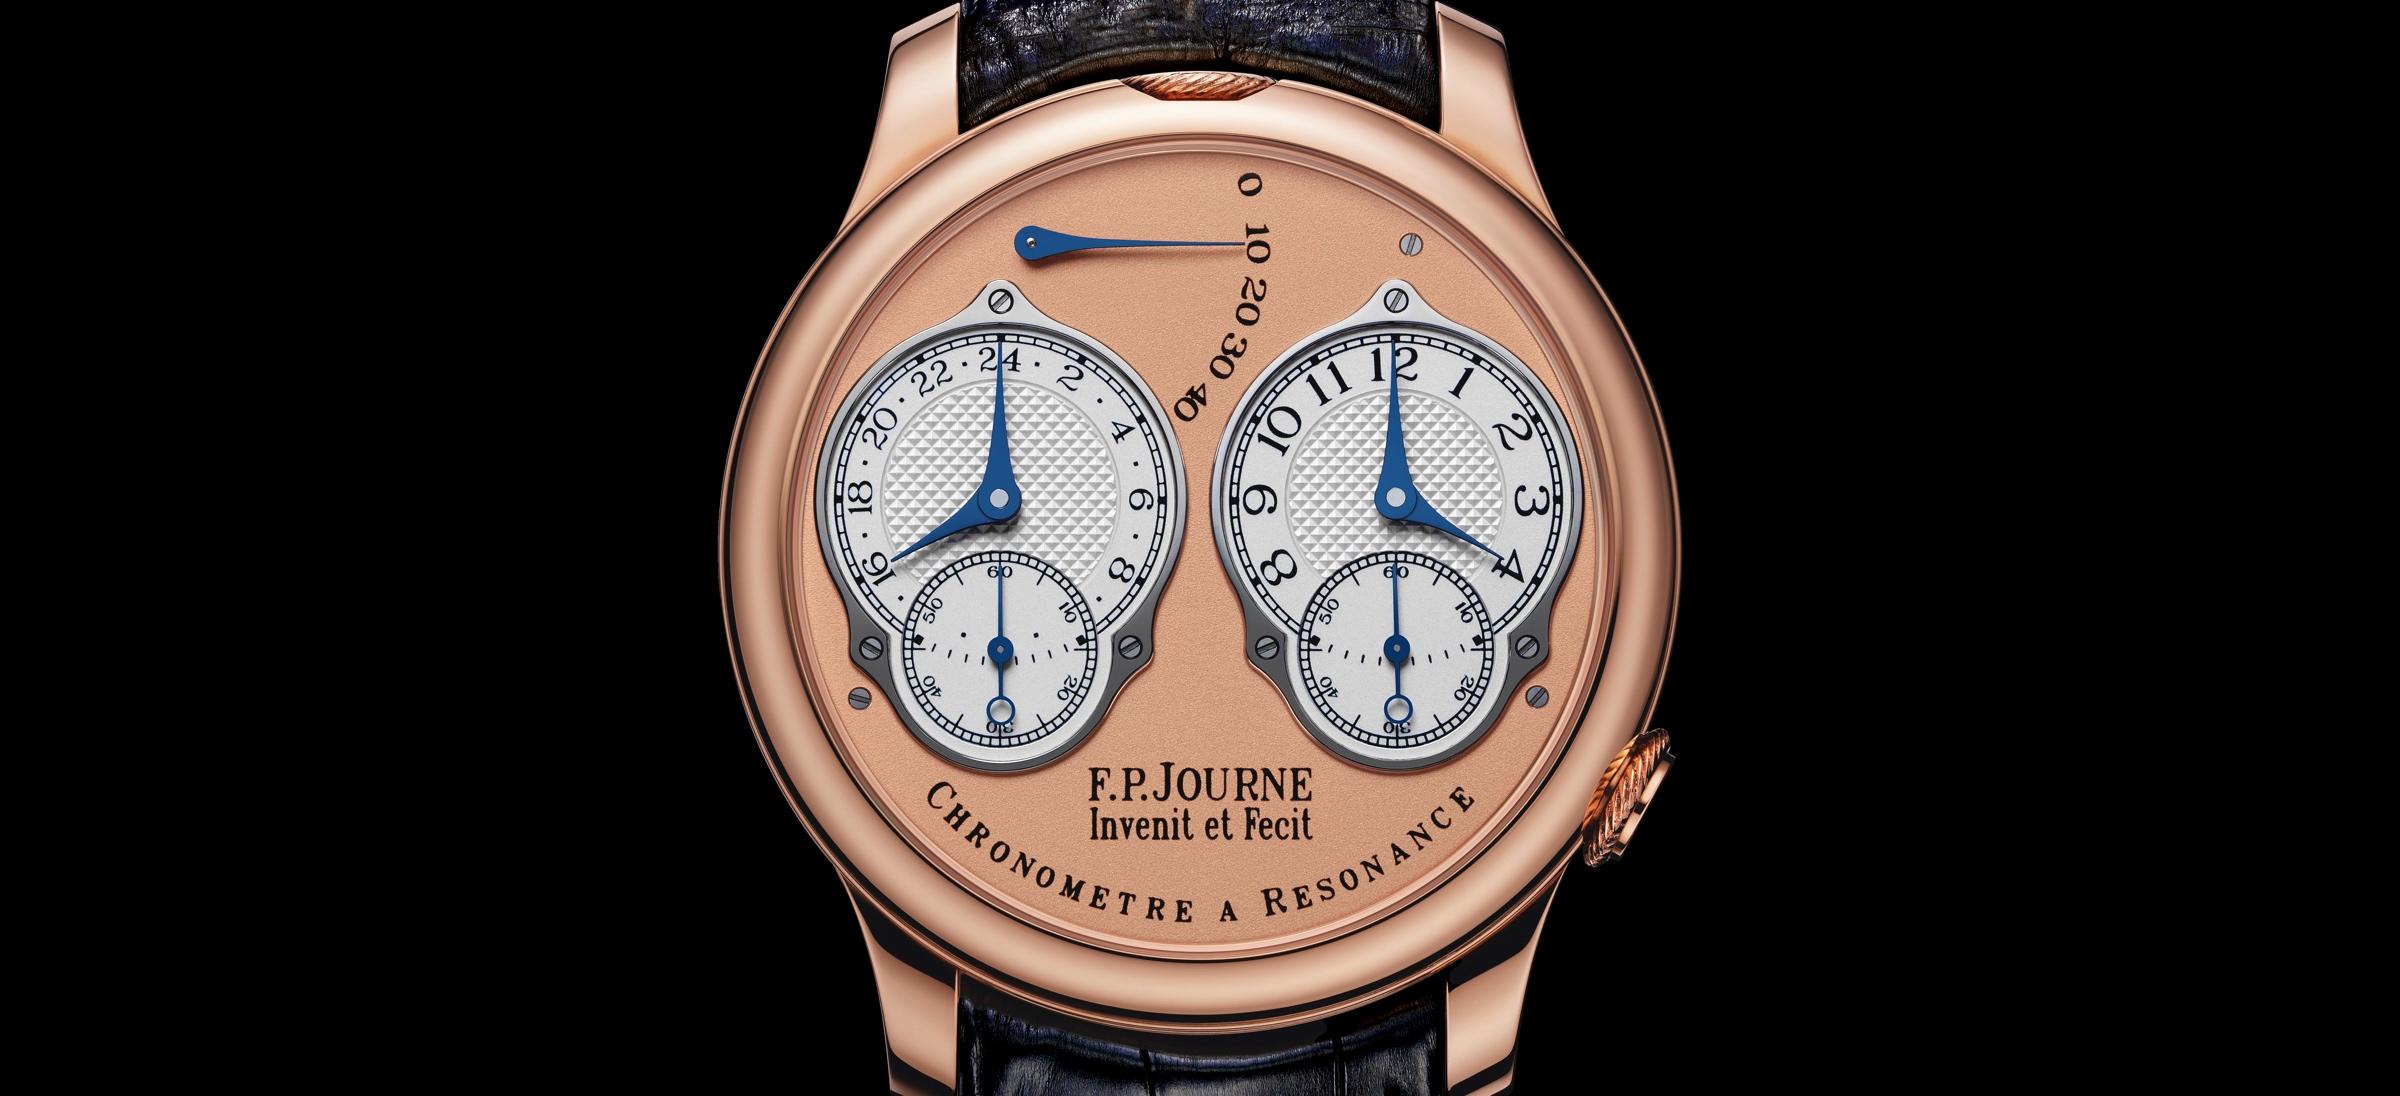 F.P. Journe Chronometre a Resonance 2019 - cover